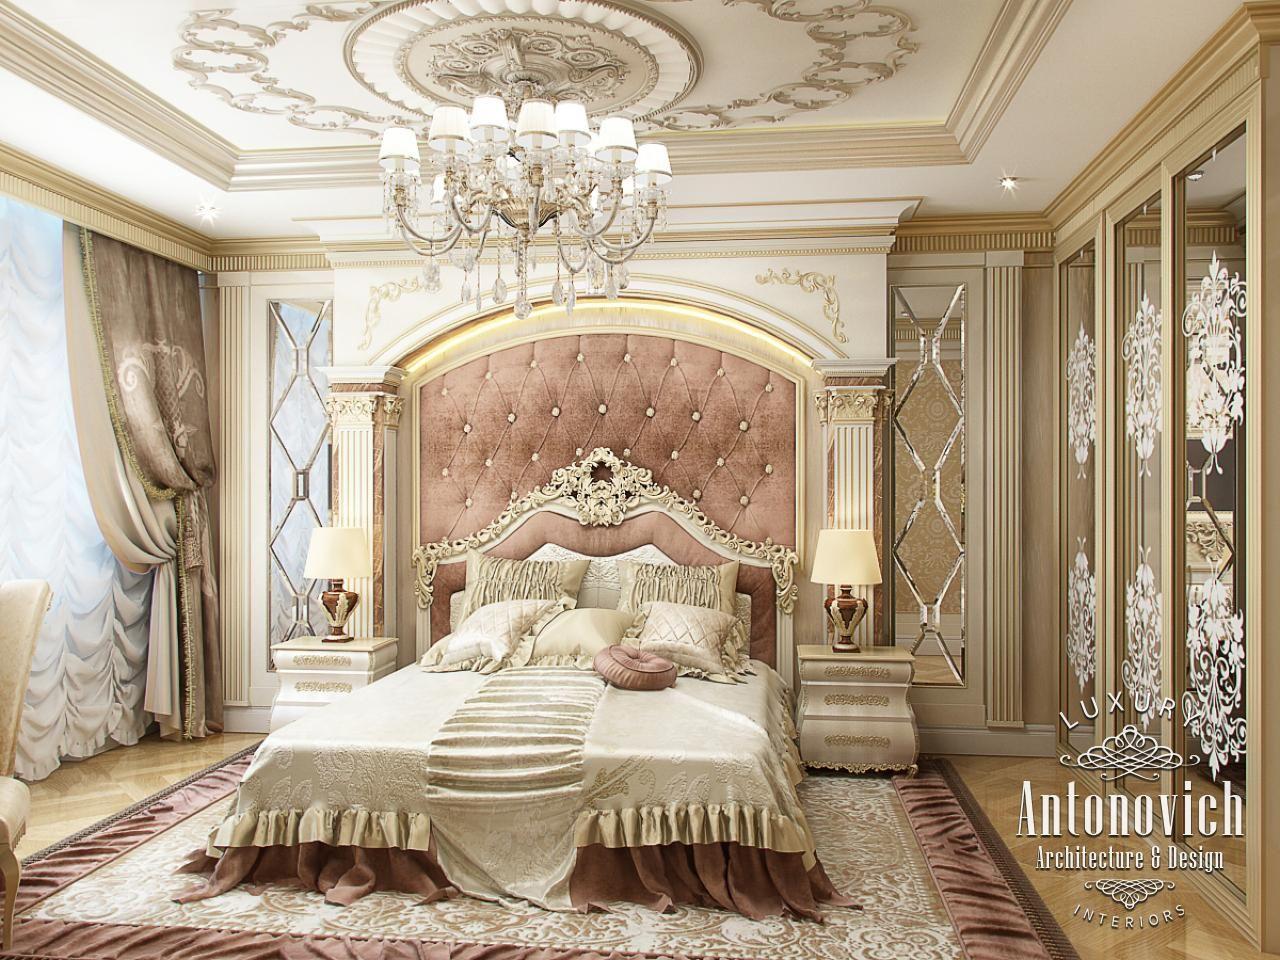 royal luxurious bedrooms luxurious bedrooms luxury on home interior design bedroom id=60843